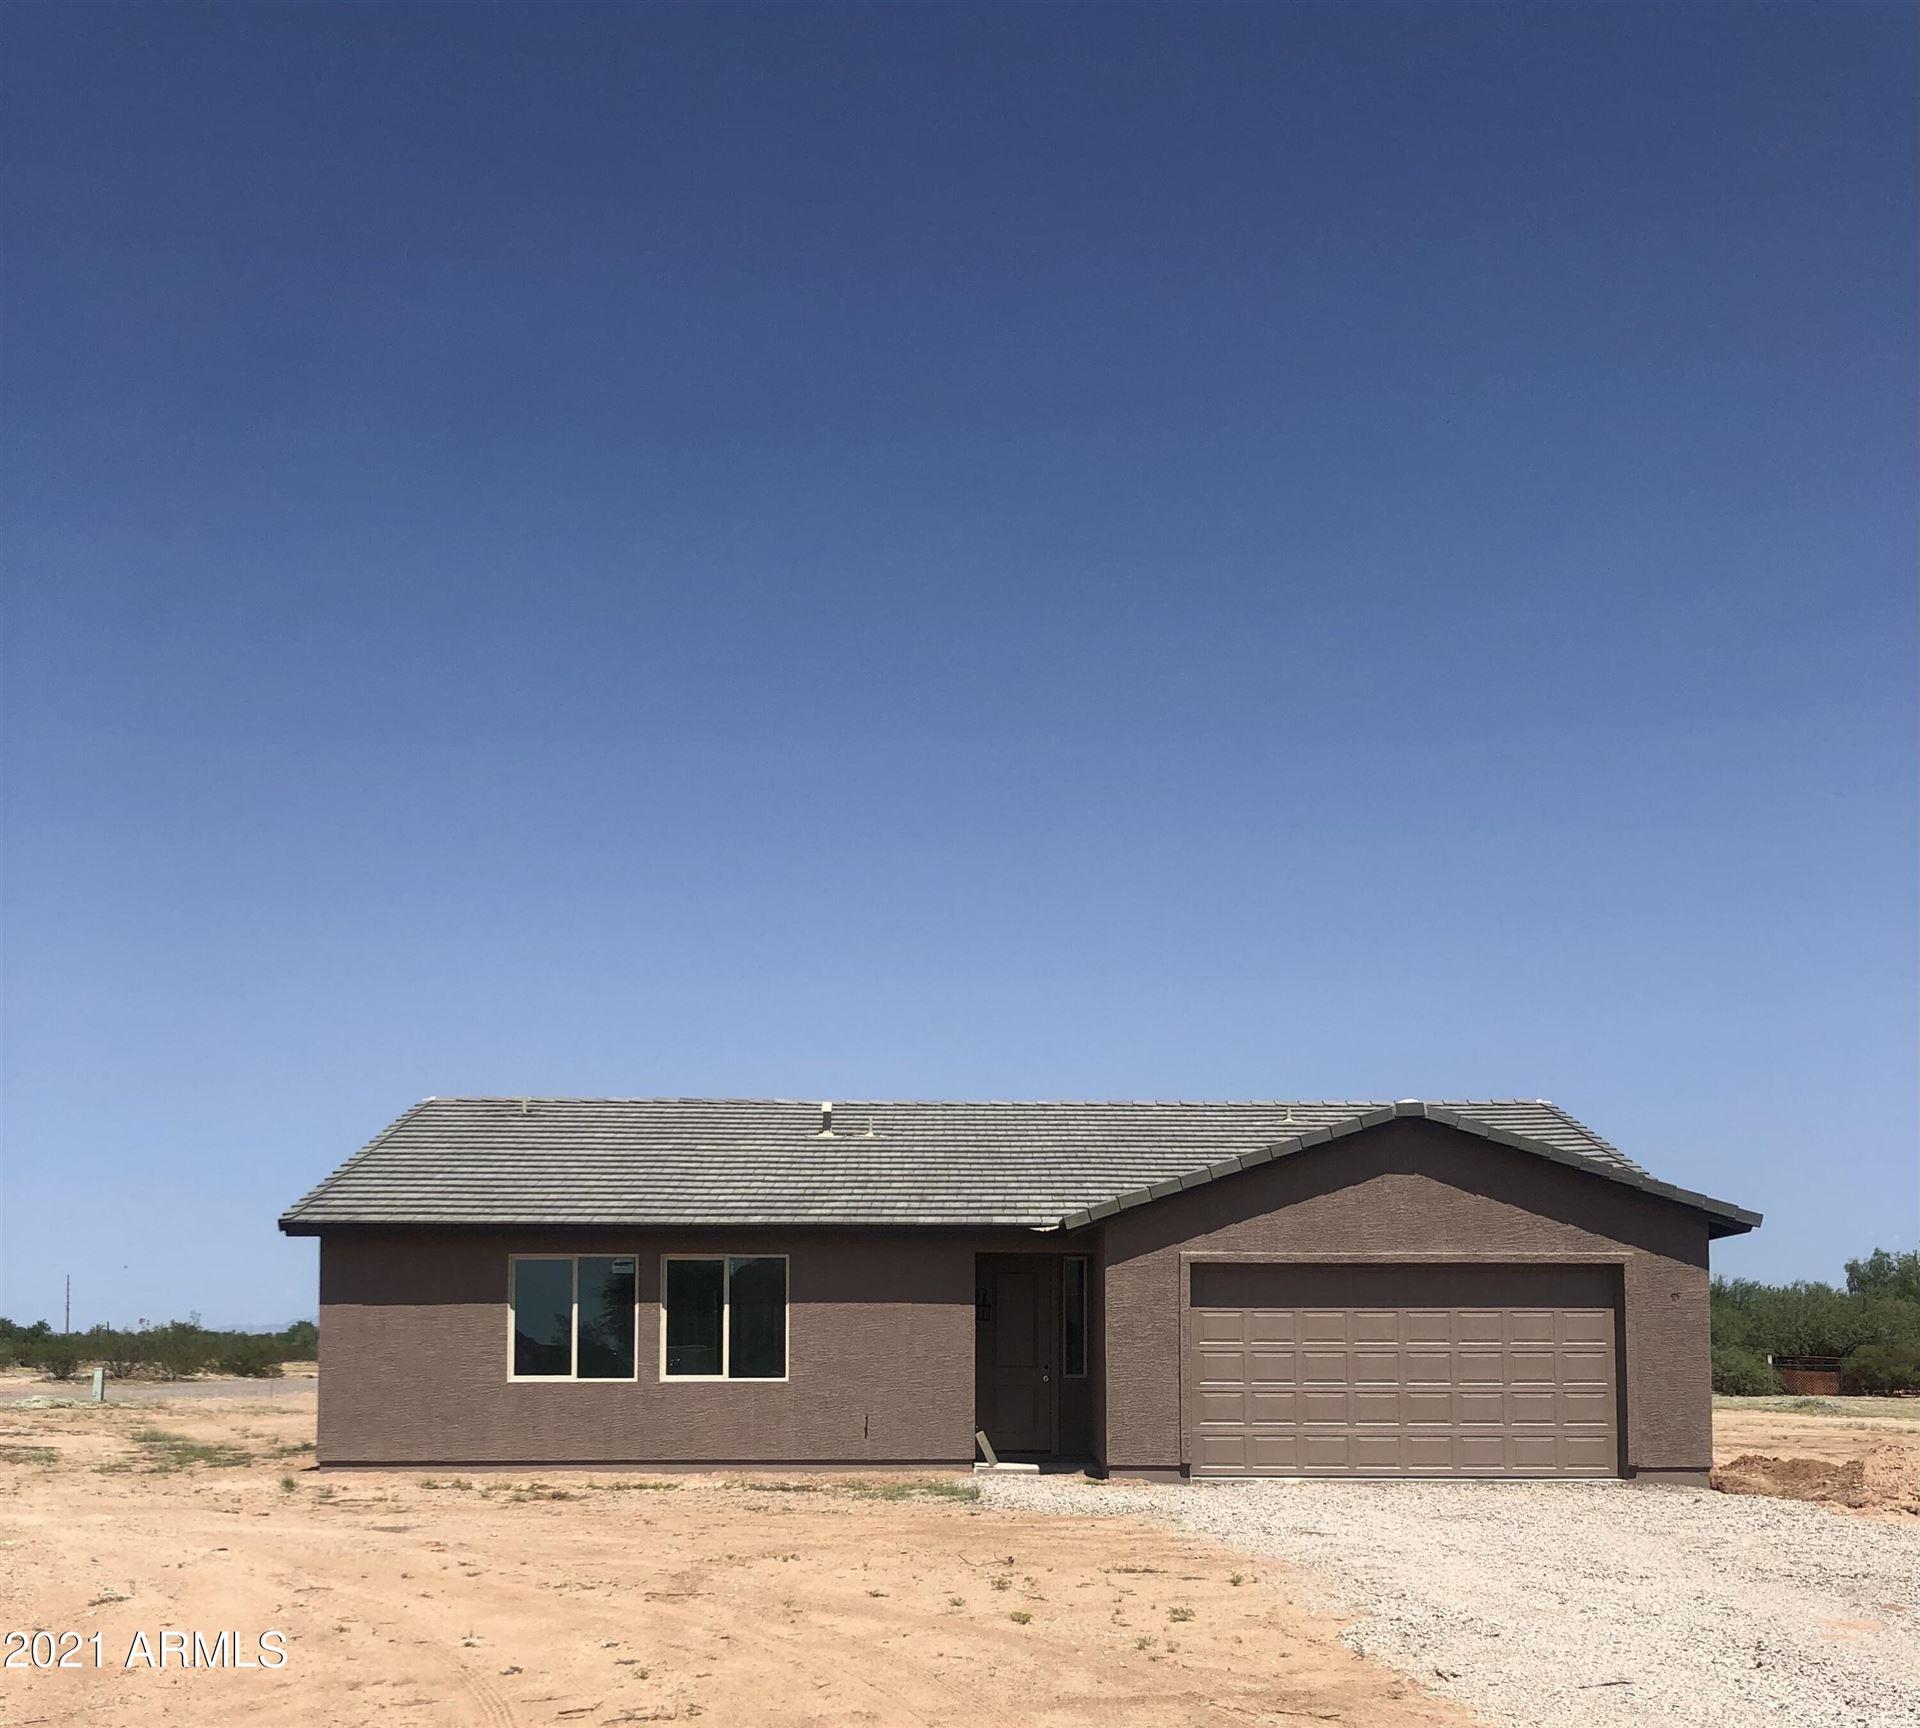 Photo of 25642 W GAMBIT Trail, Wittmann, AZ 85361 (MLS # 6288623)